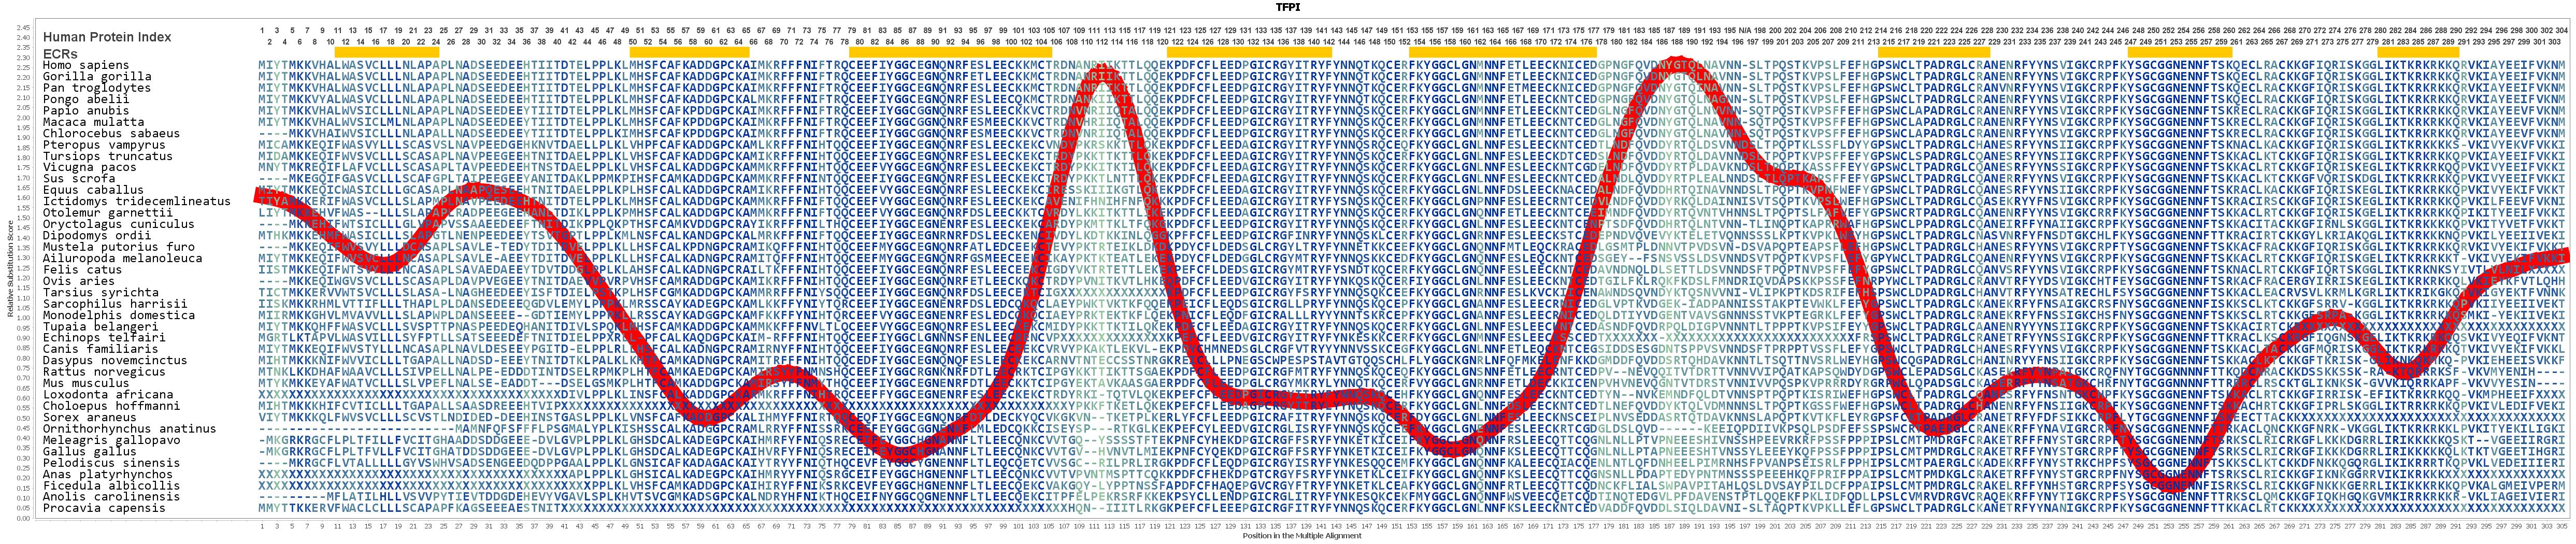 TFPI Gene GeneCards TFPI1 Protein